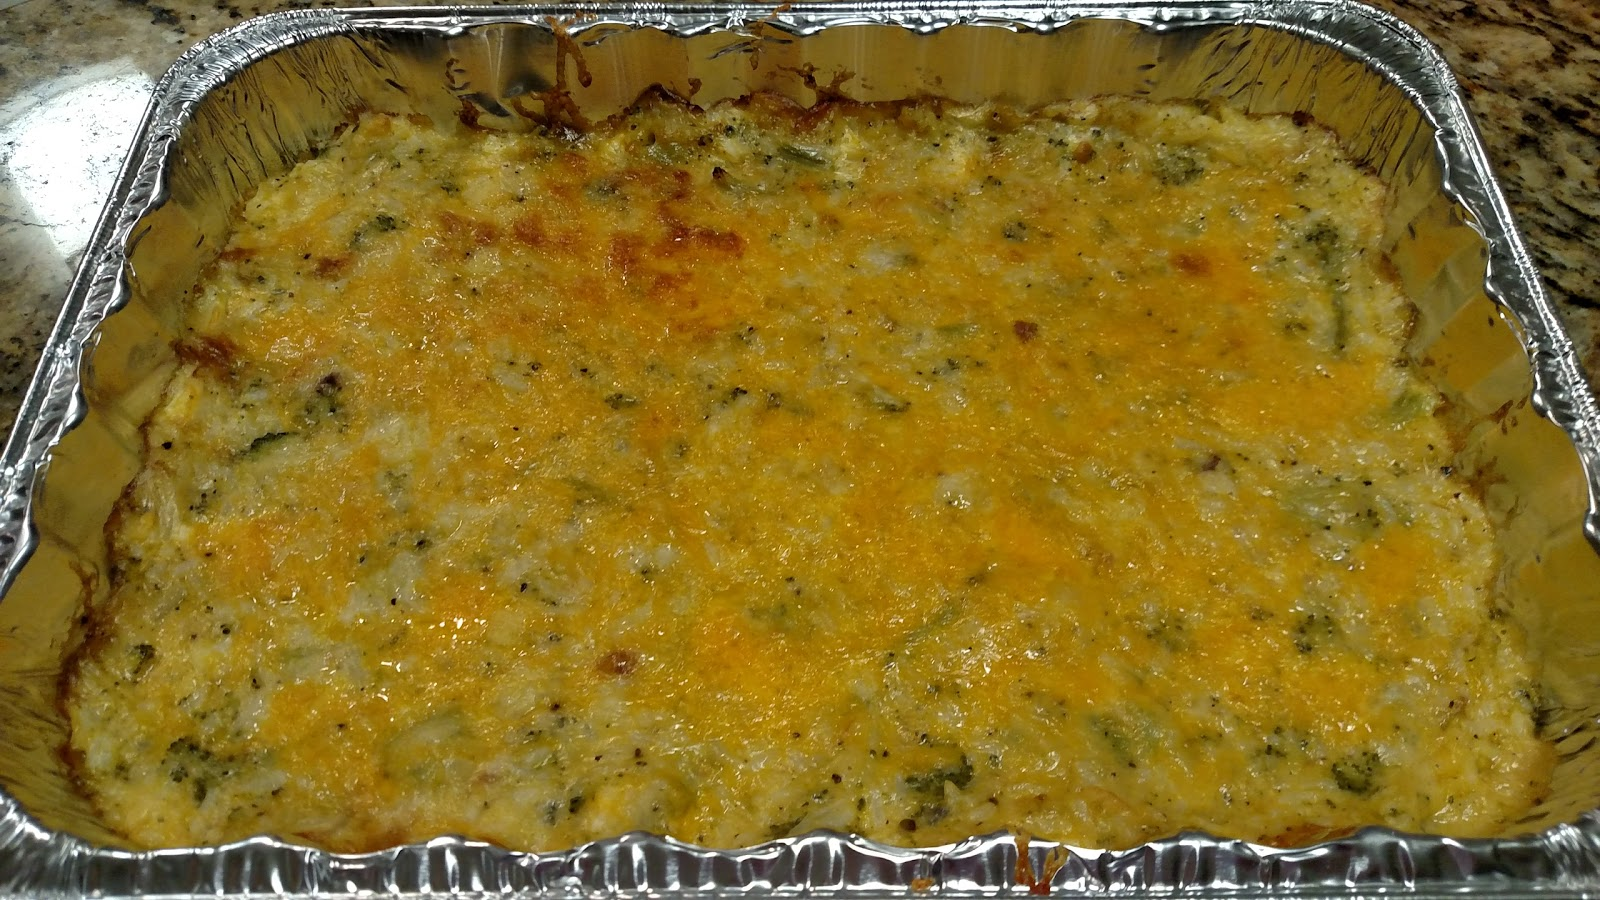 Broccoli Rice Cheese And Chicken Casserole